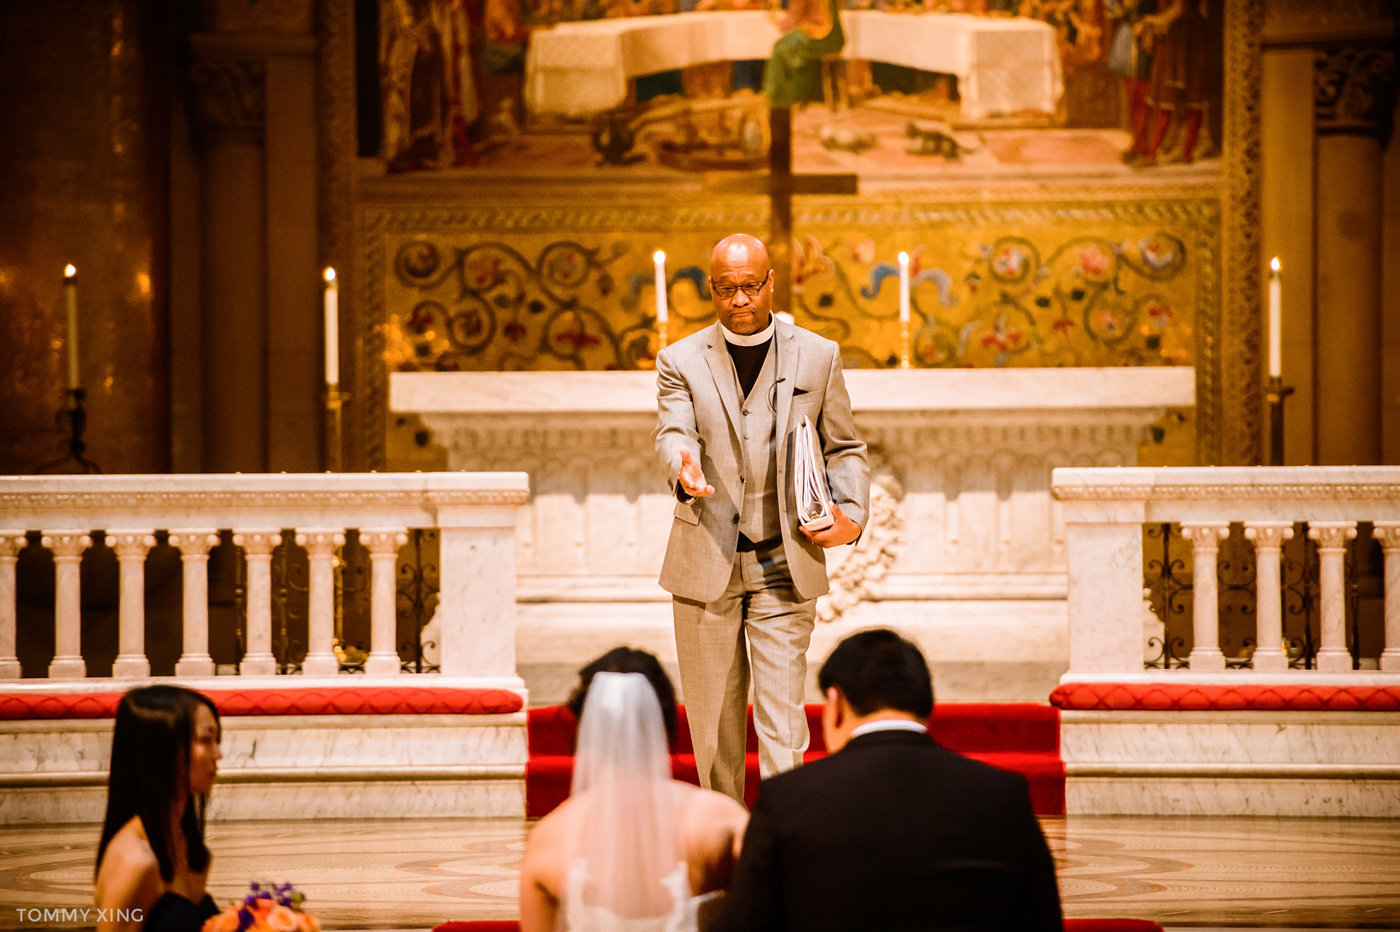 STANFORD MEMORIAL CHURCH WEDDING - Wenjie & Chengcheng - SAN FRANCISCO BAY AREA 斯坦福教堂婚礼跟拍 - 洛杉矶婚礼婚纱照摄影师 Tommy Xing Photography091.jpg